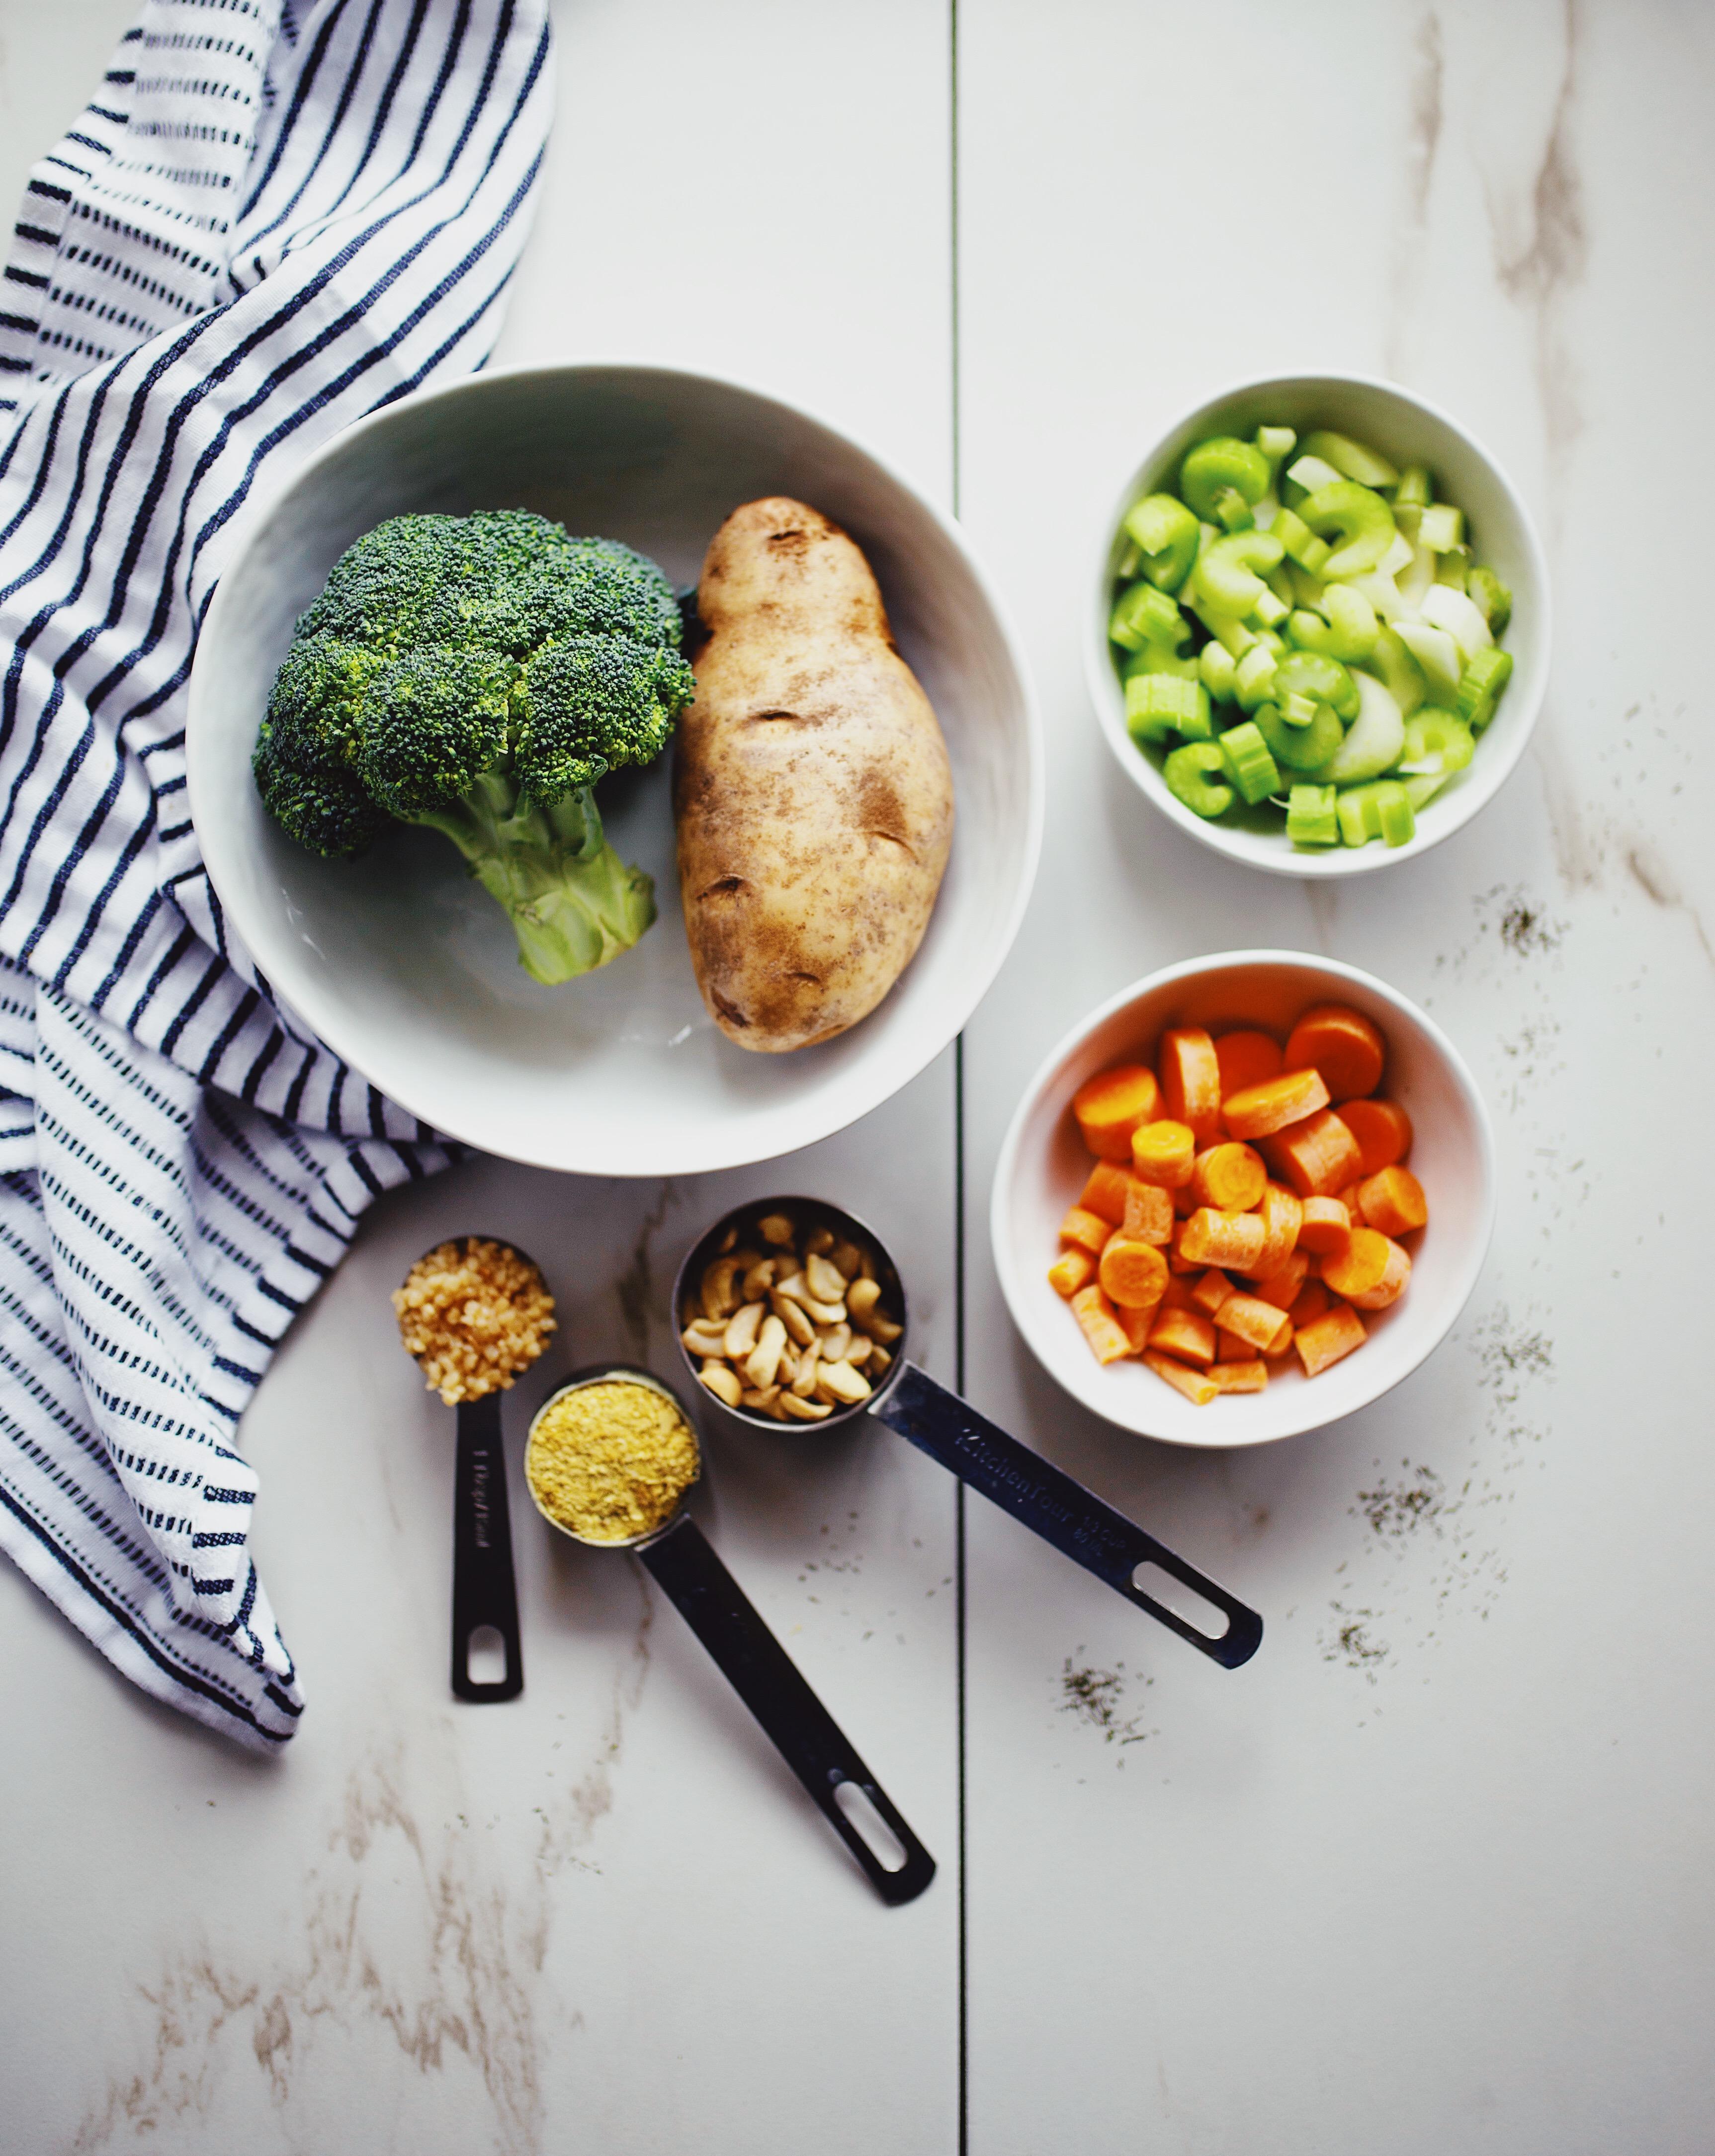 Ingredients for vegan broccoli cheddar soup